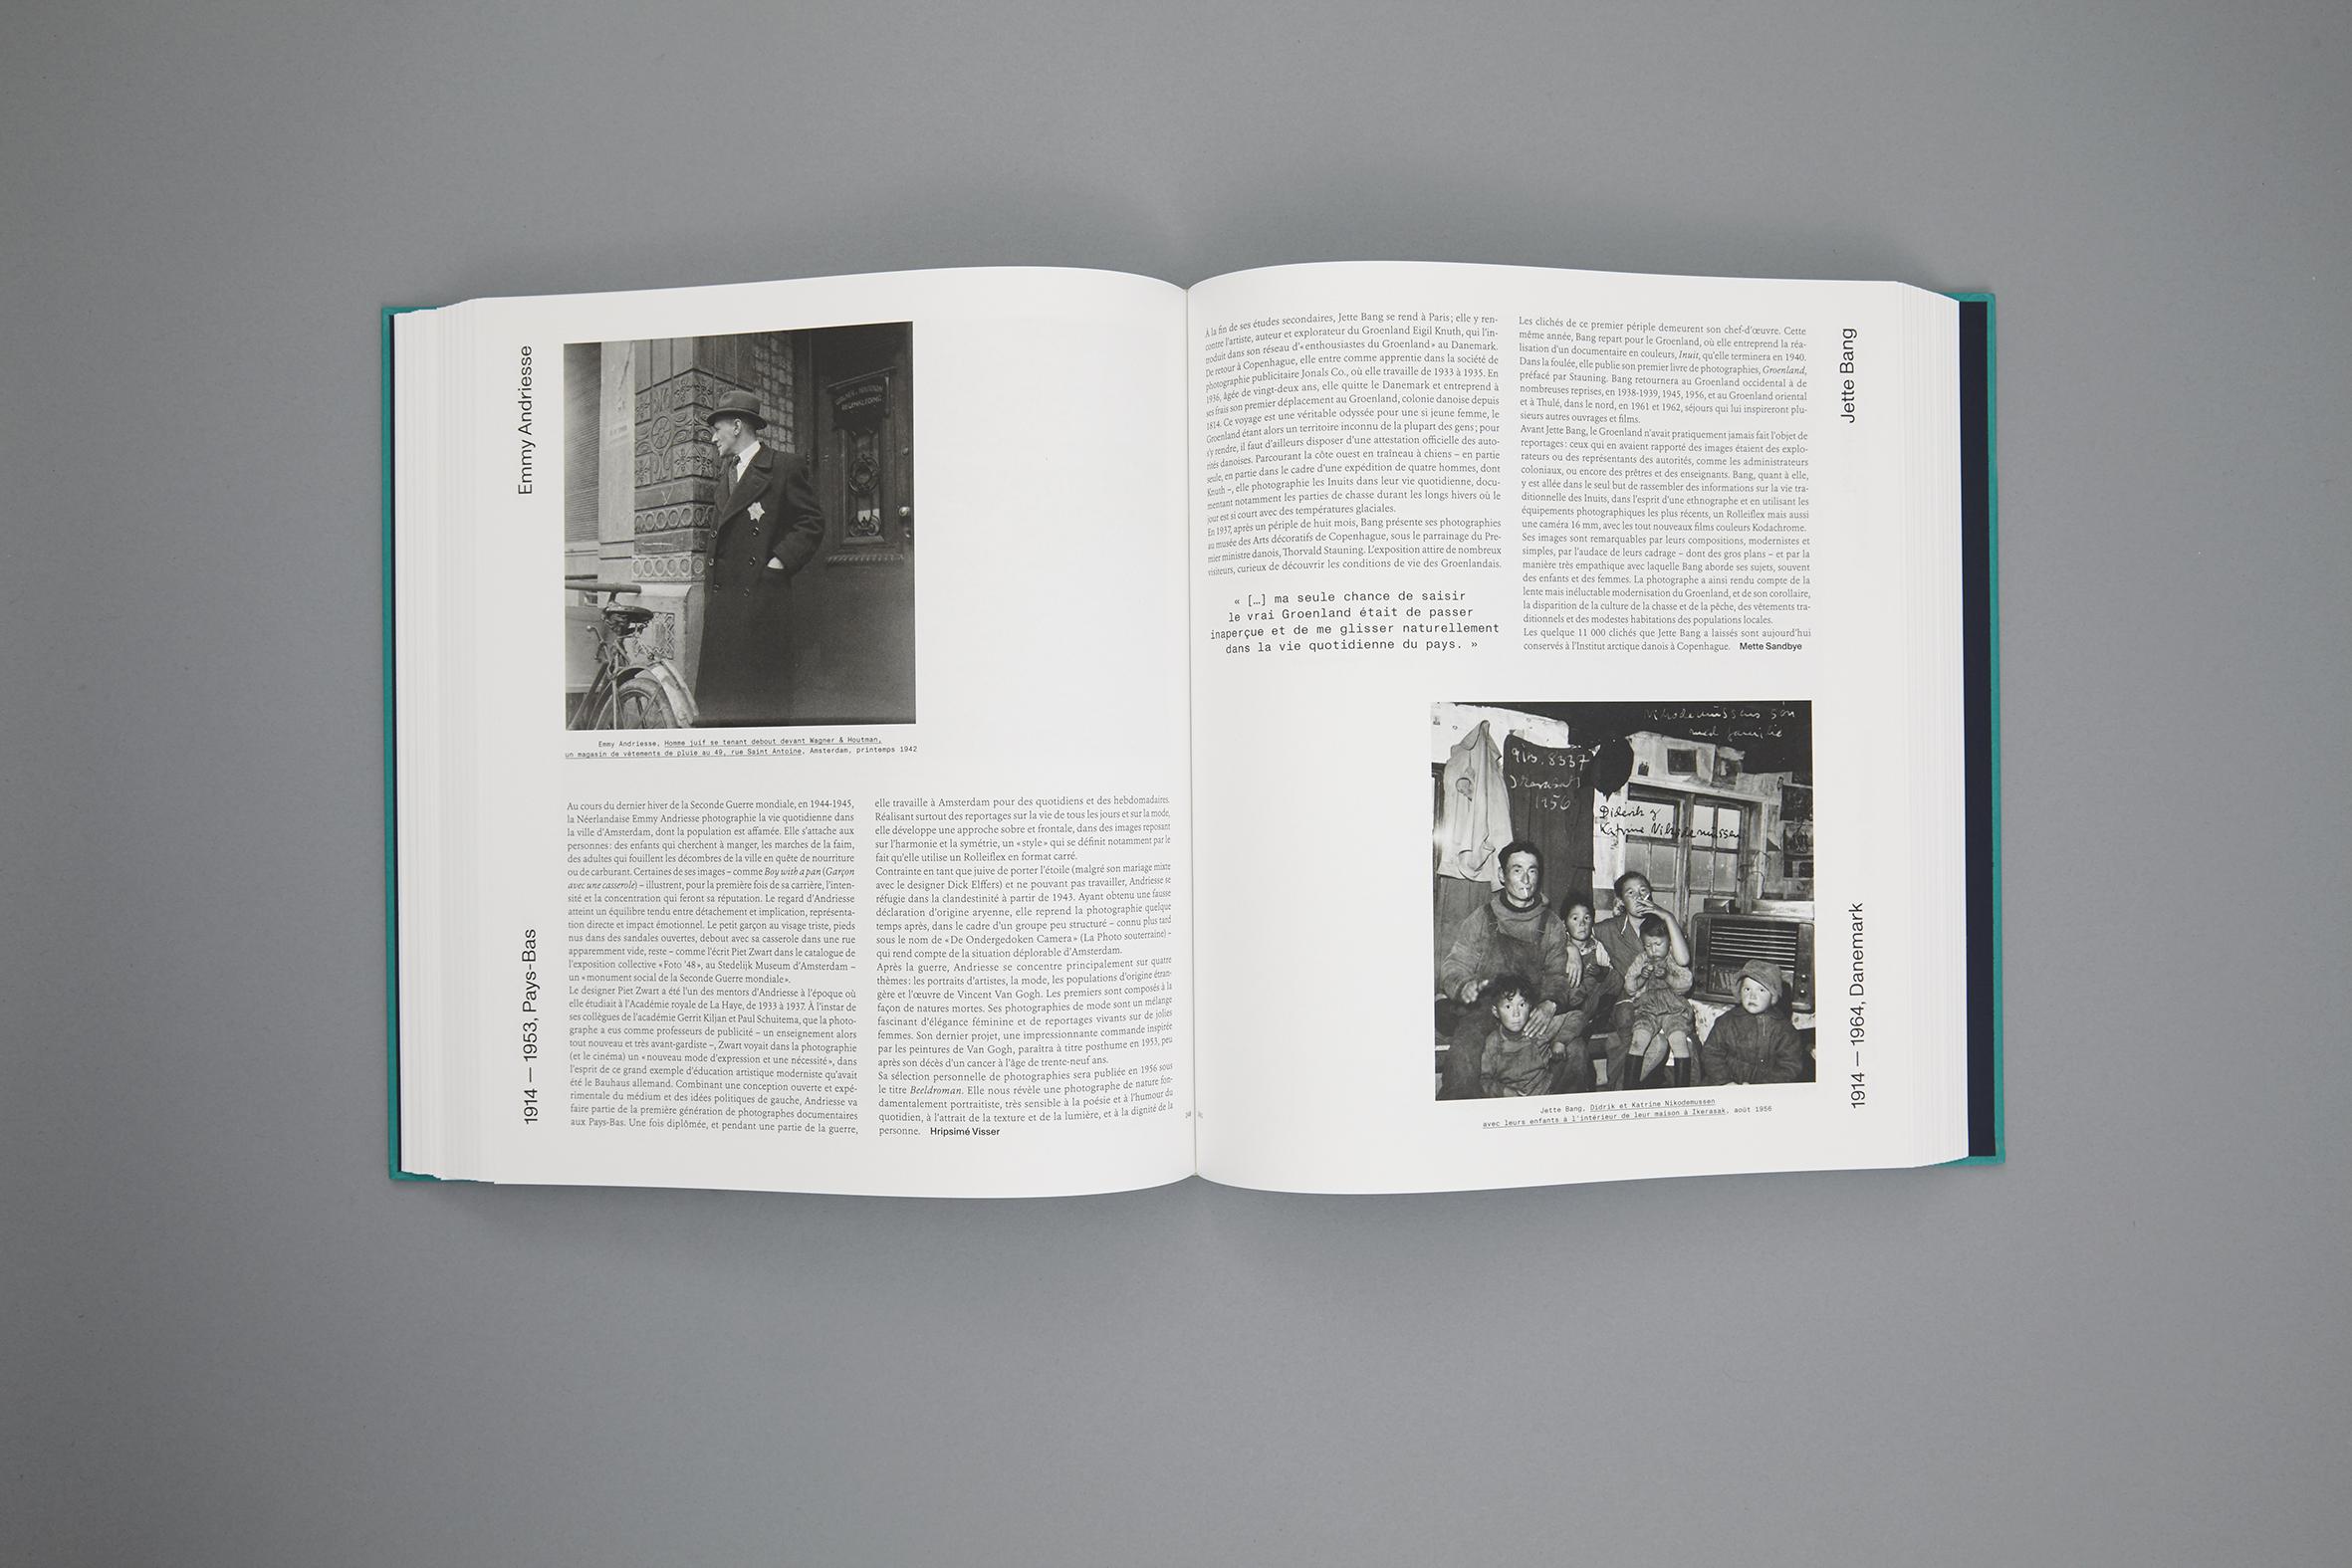 lebart-robert-dahan-histoire-mondiale-femmes-photographes-delpire-co-3